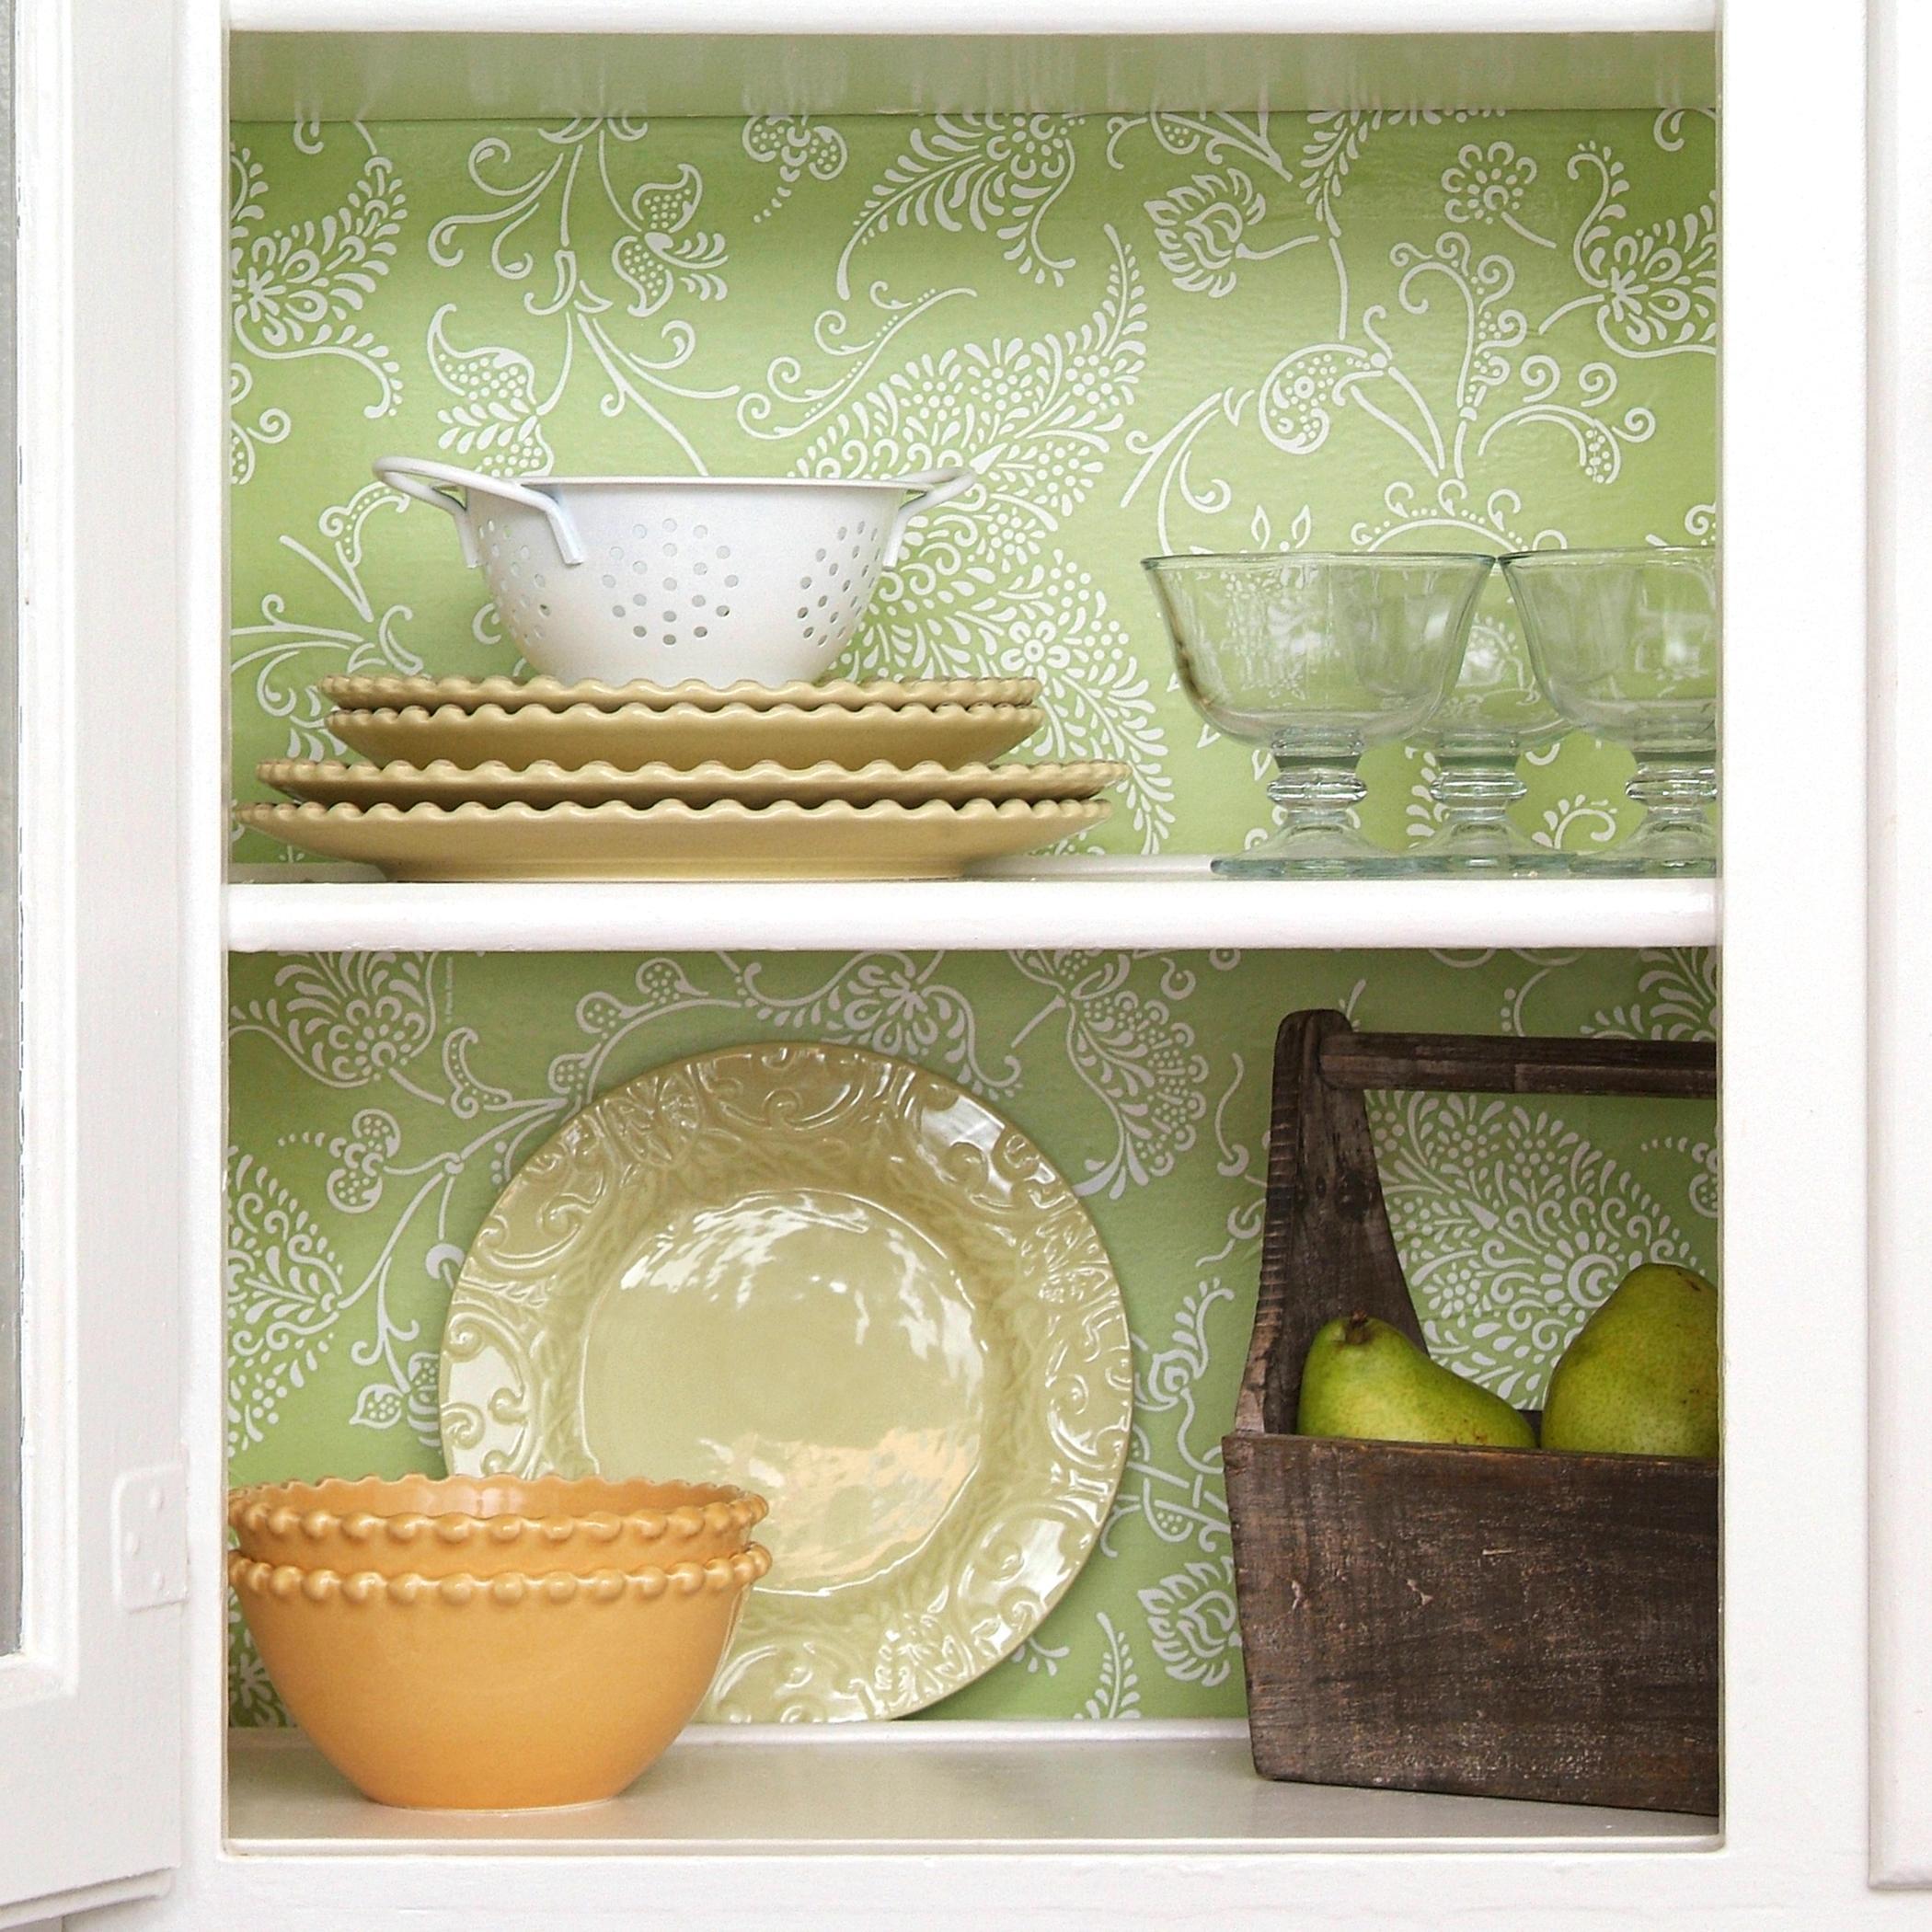 Kitchen Shelf Liner Walmart: Con-Tact Creative Covering Self-Adhesive